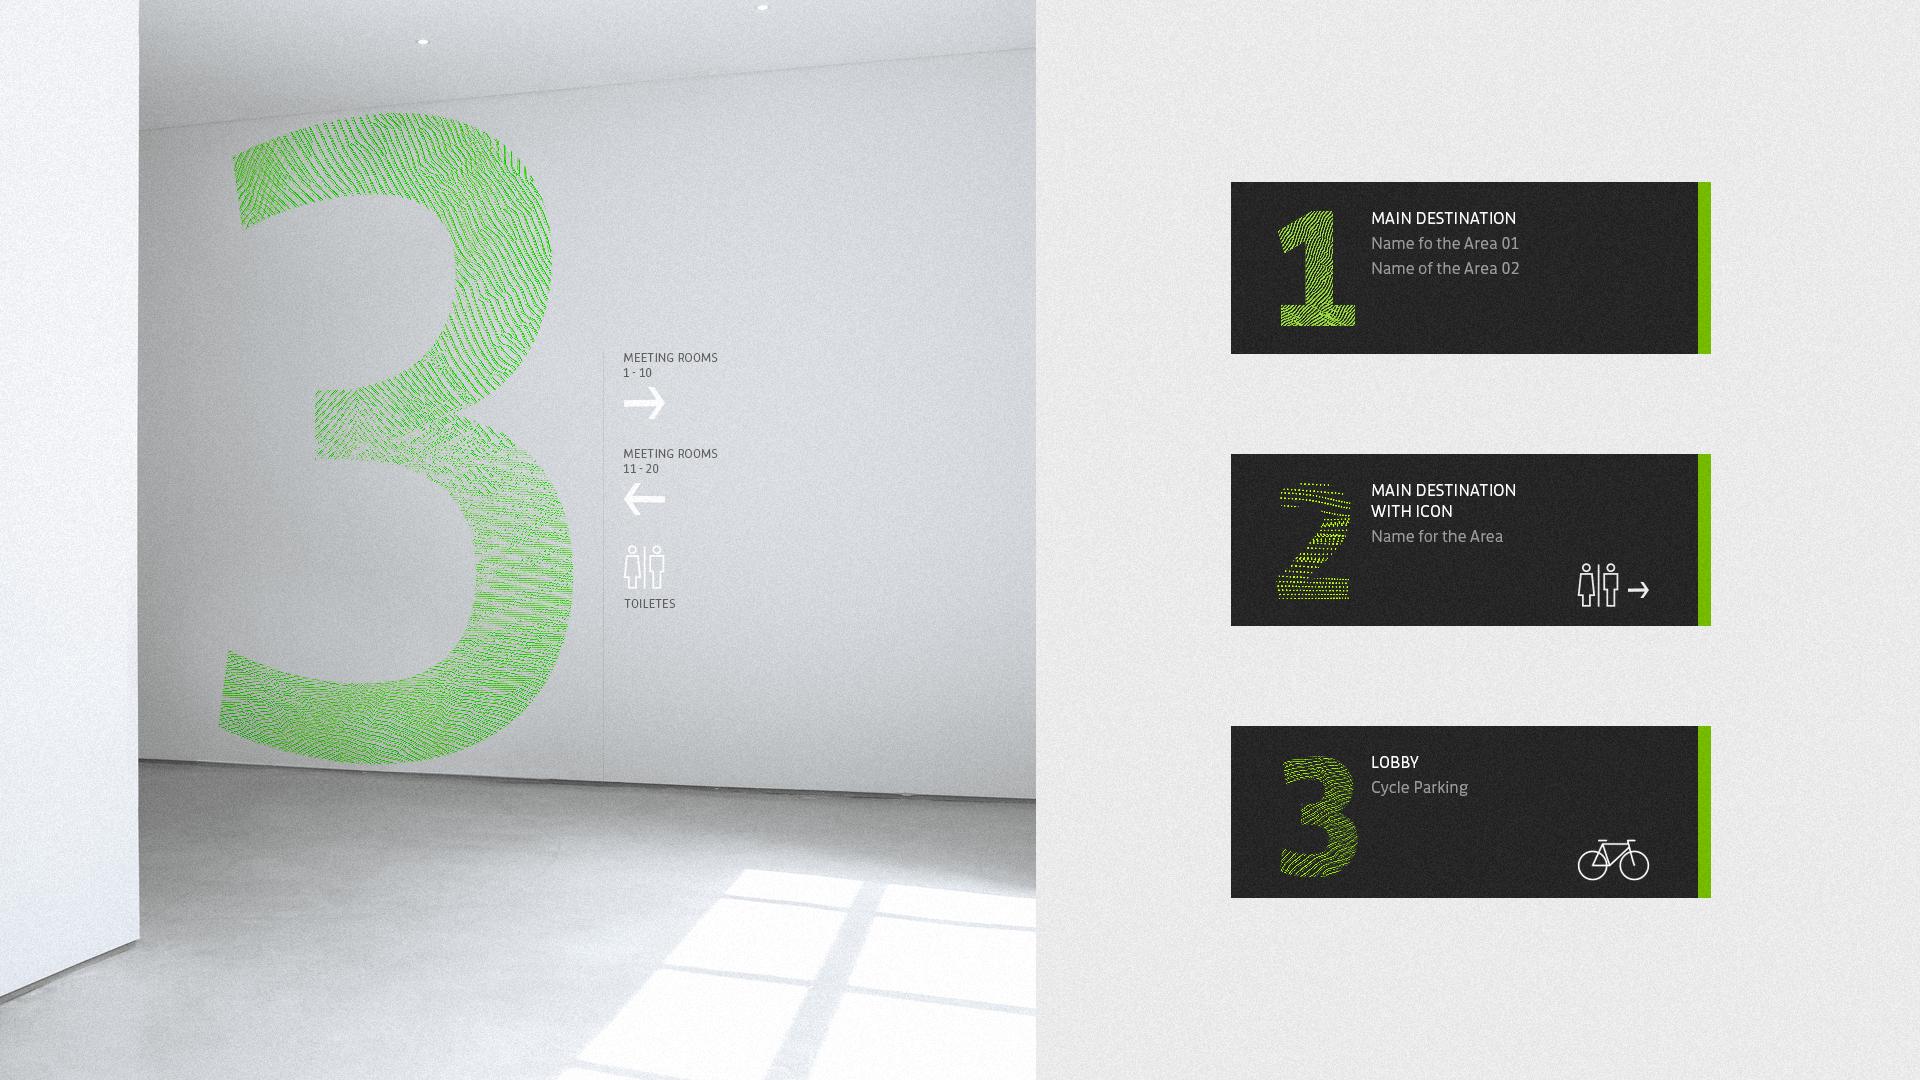 LLOYDS-GroupTech-Signage-Inside-01a